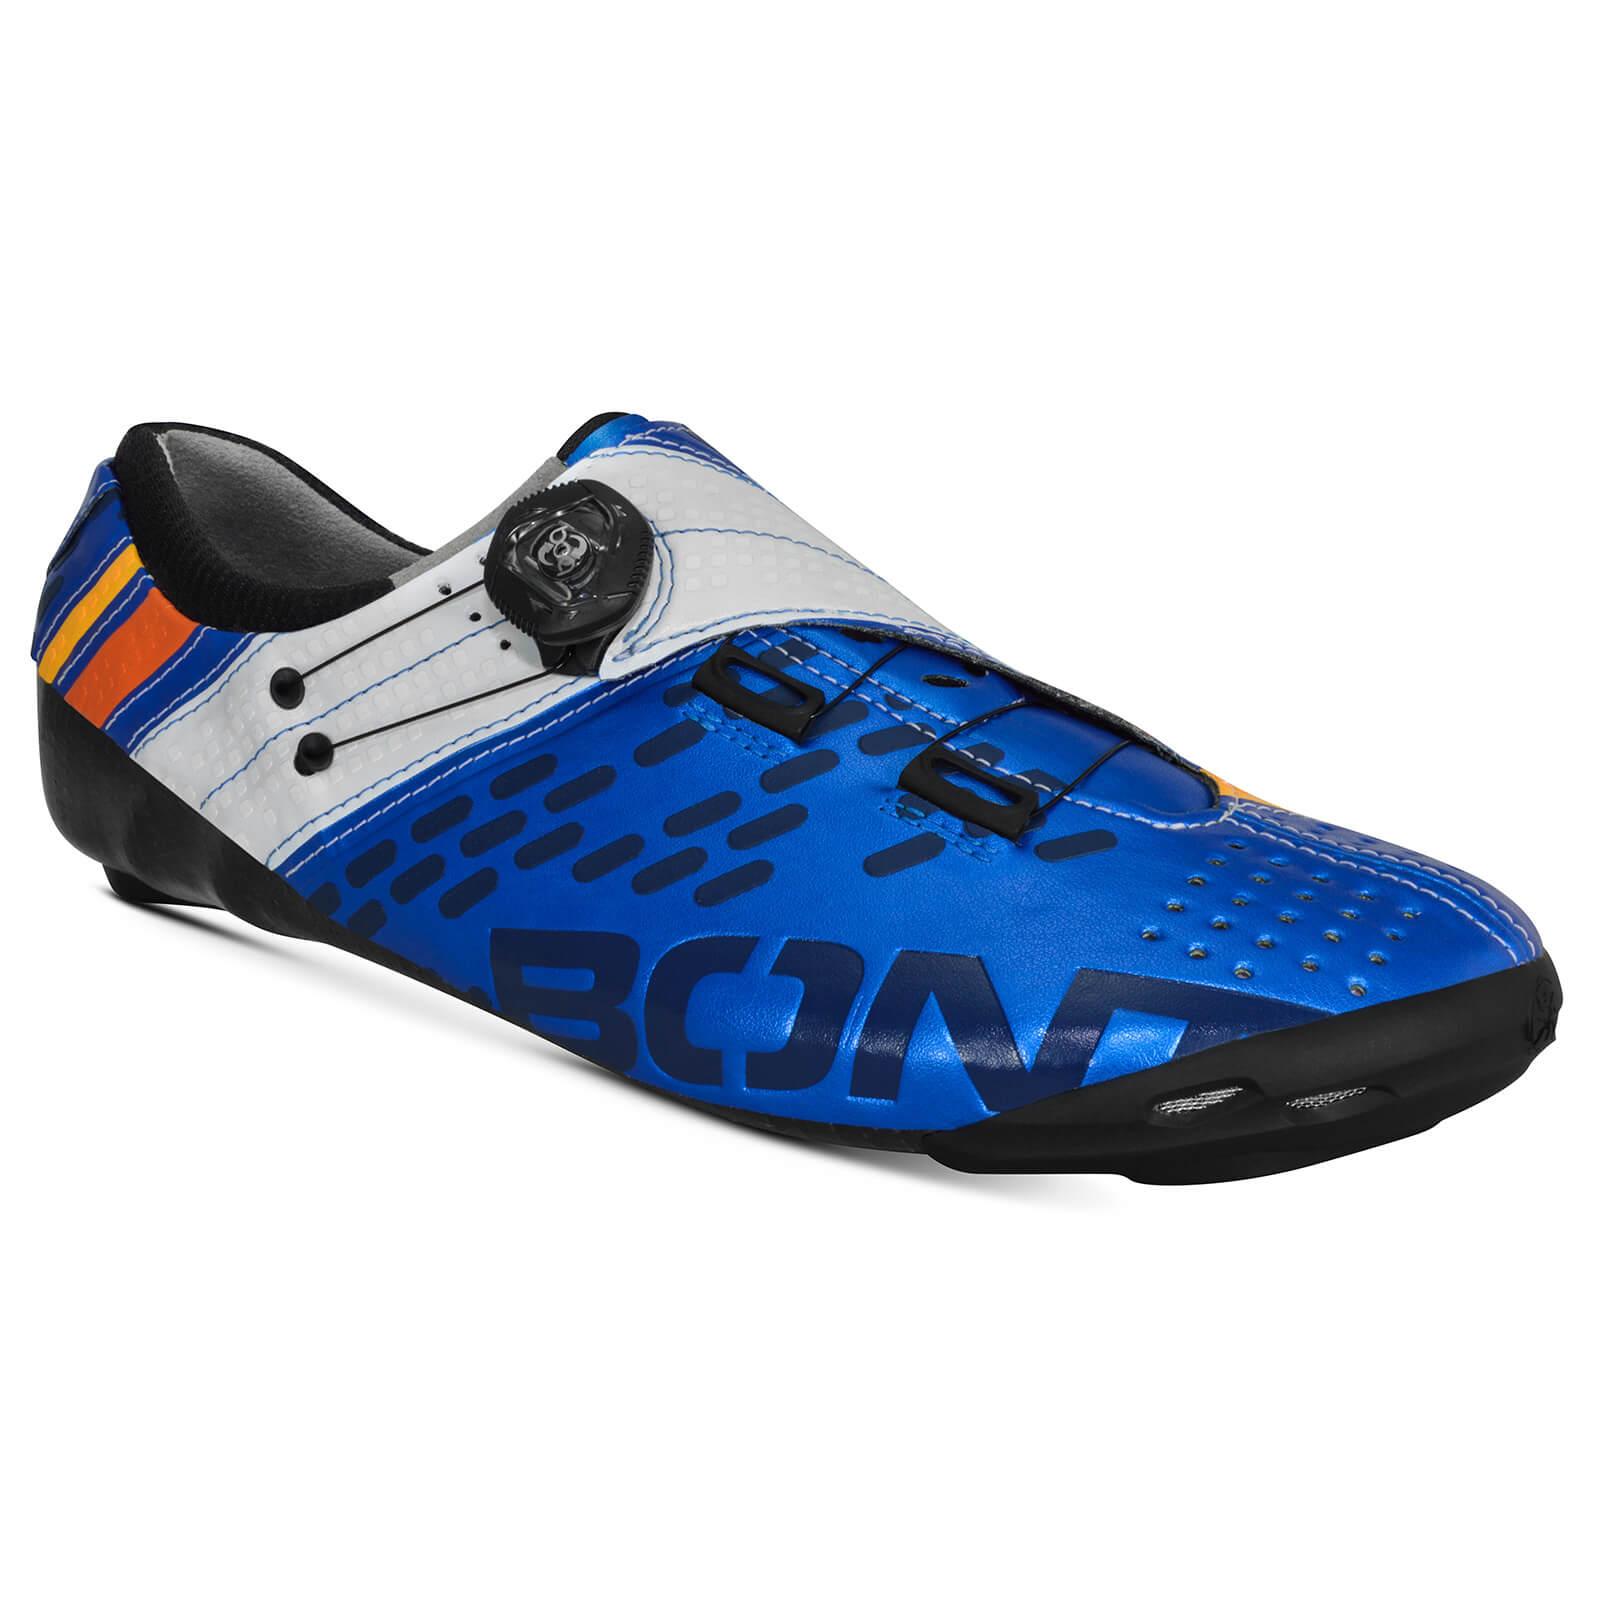 Bont Helix Road Shoes - EU 45 - Blue/White